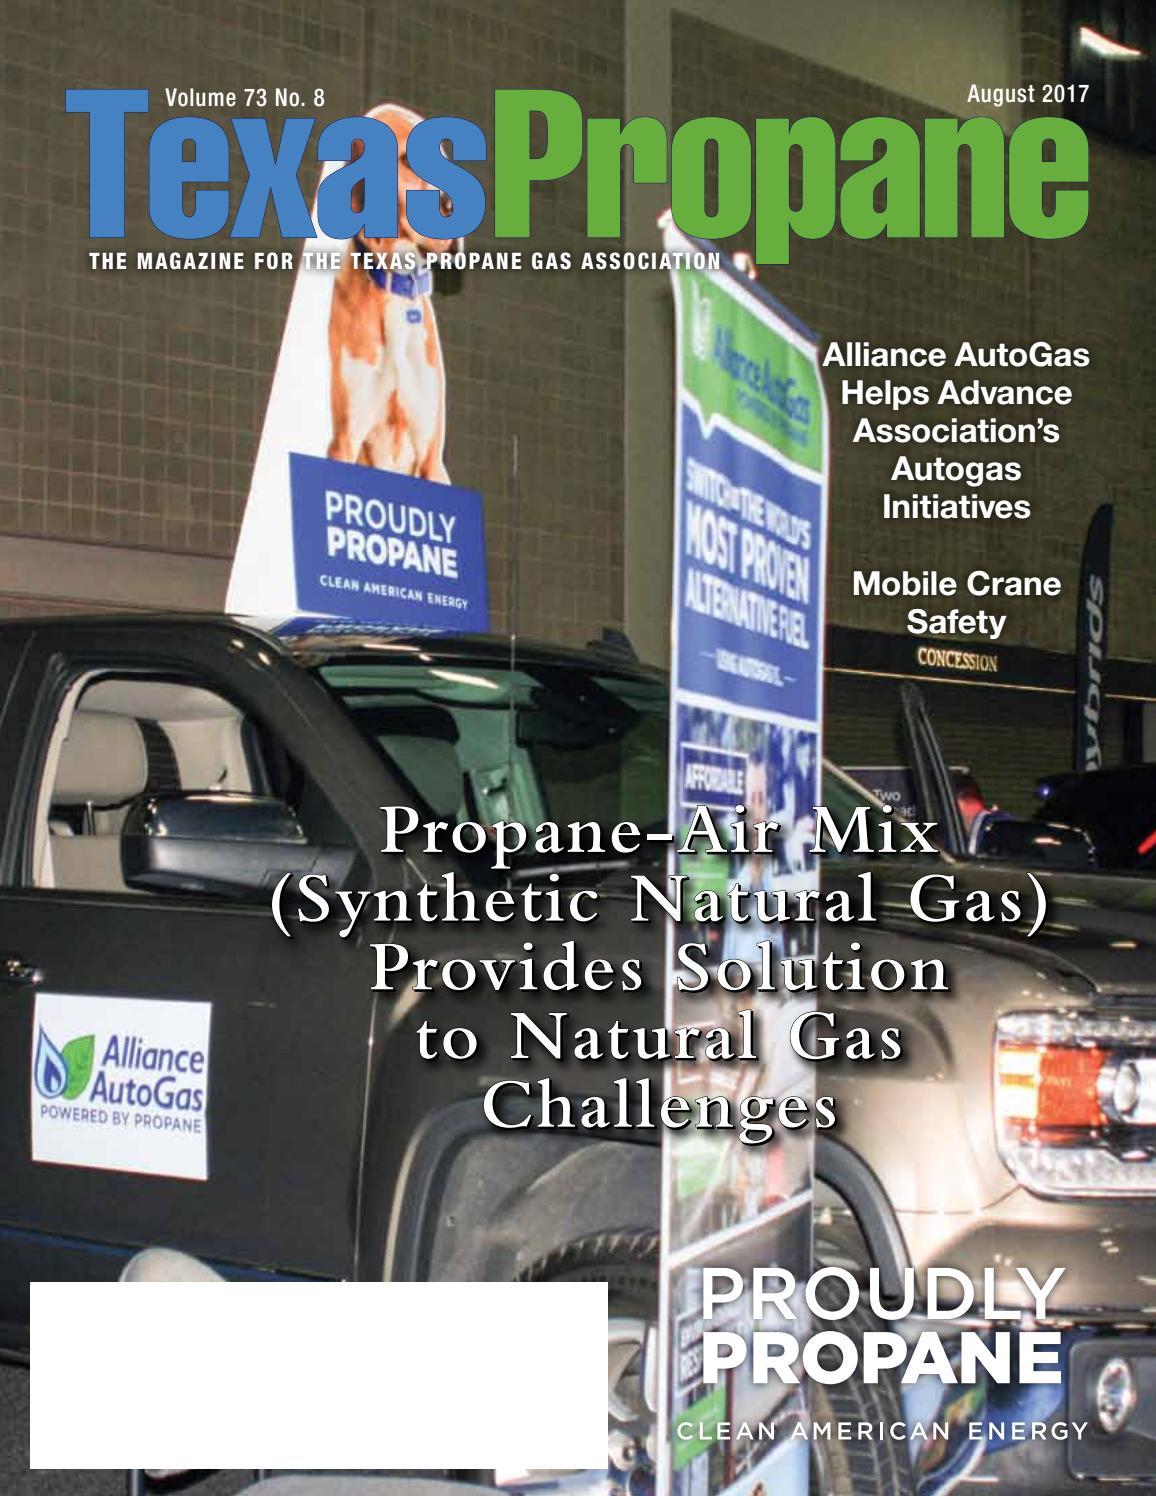 august 2017 texas propane magazine by texas propane gas